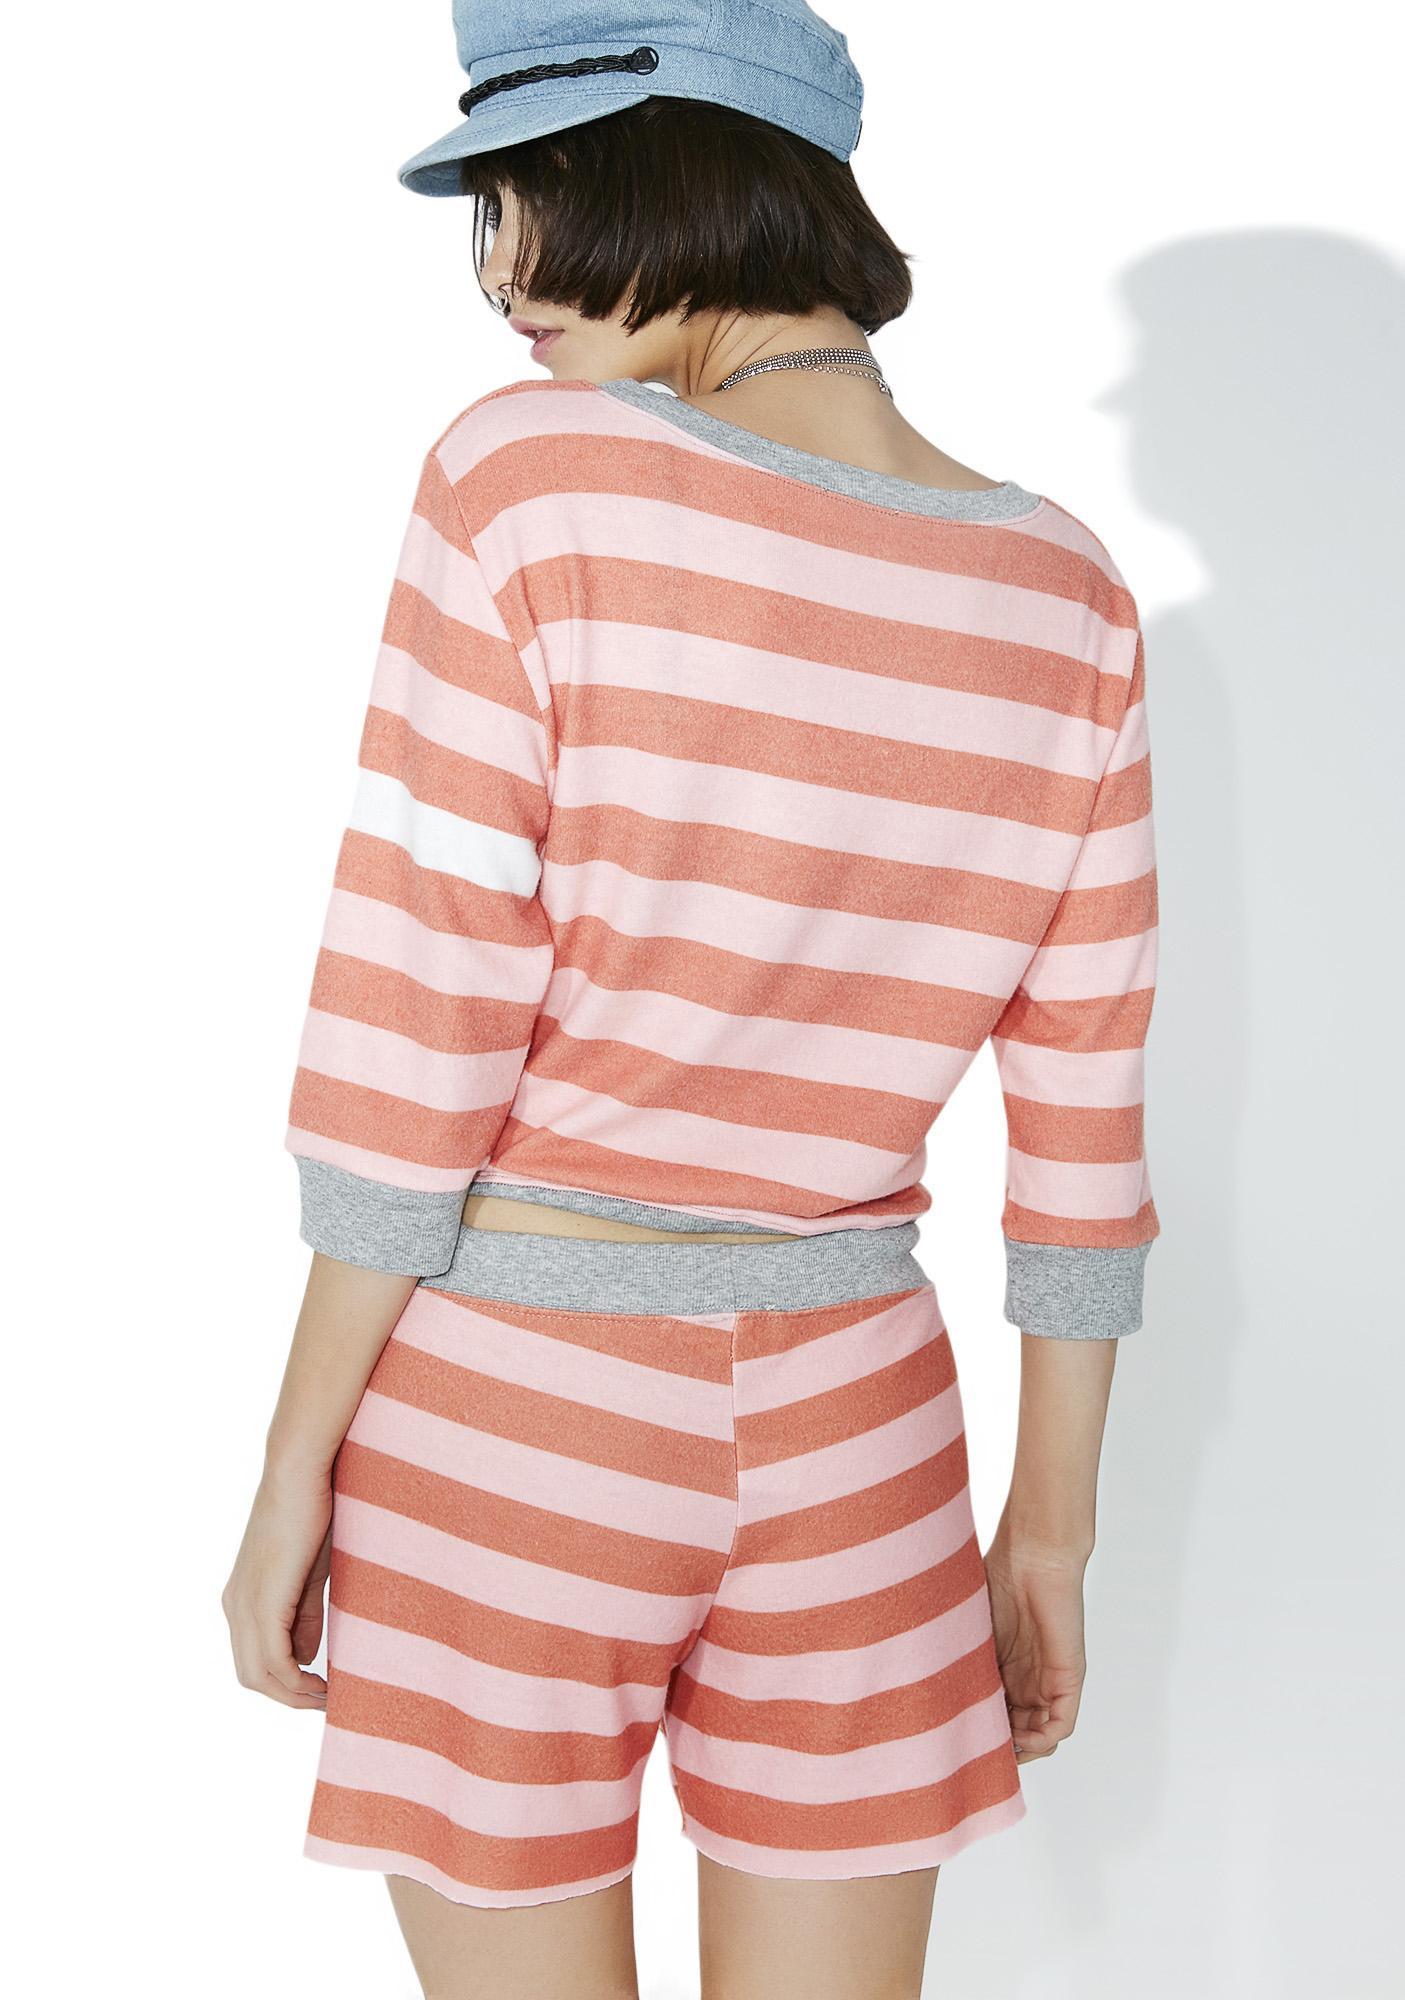 All Things Fabulous White Stripes Cozy Shorts